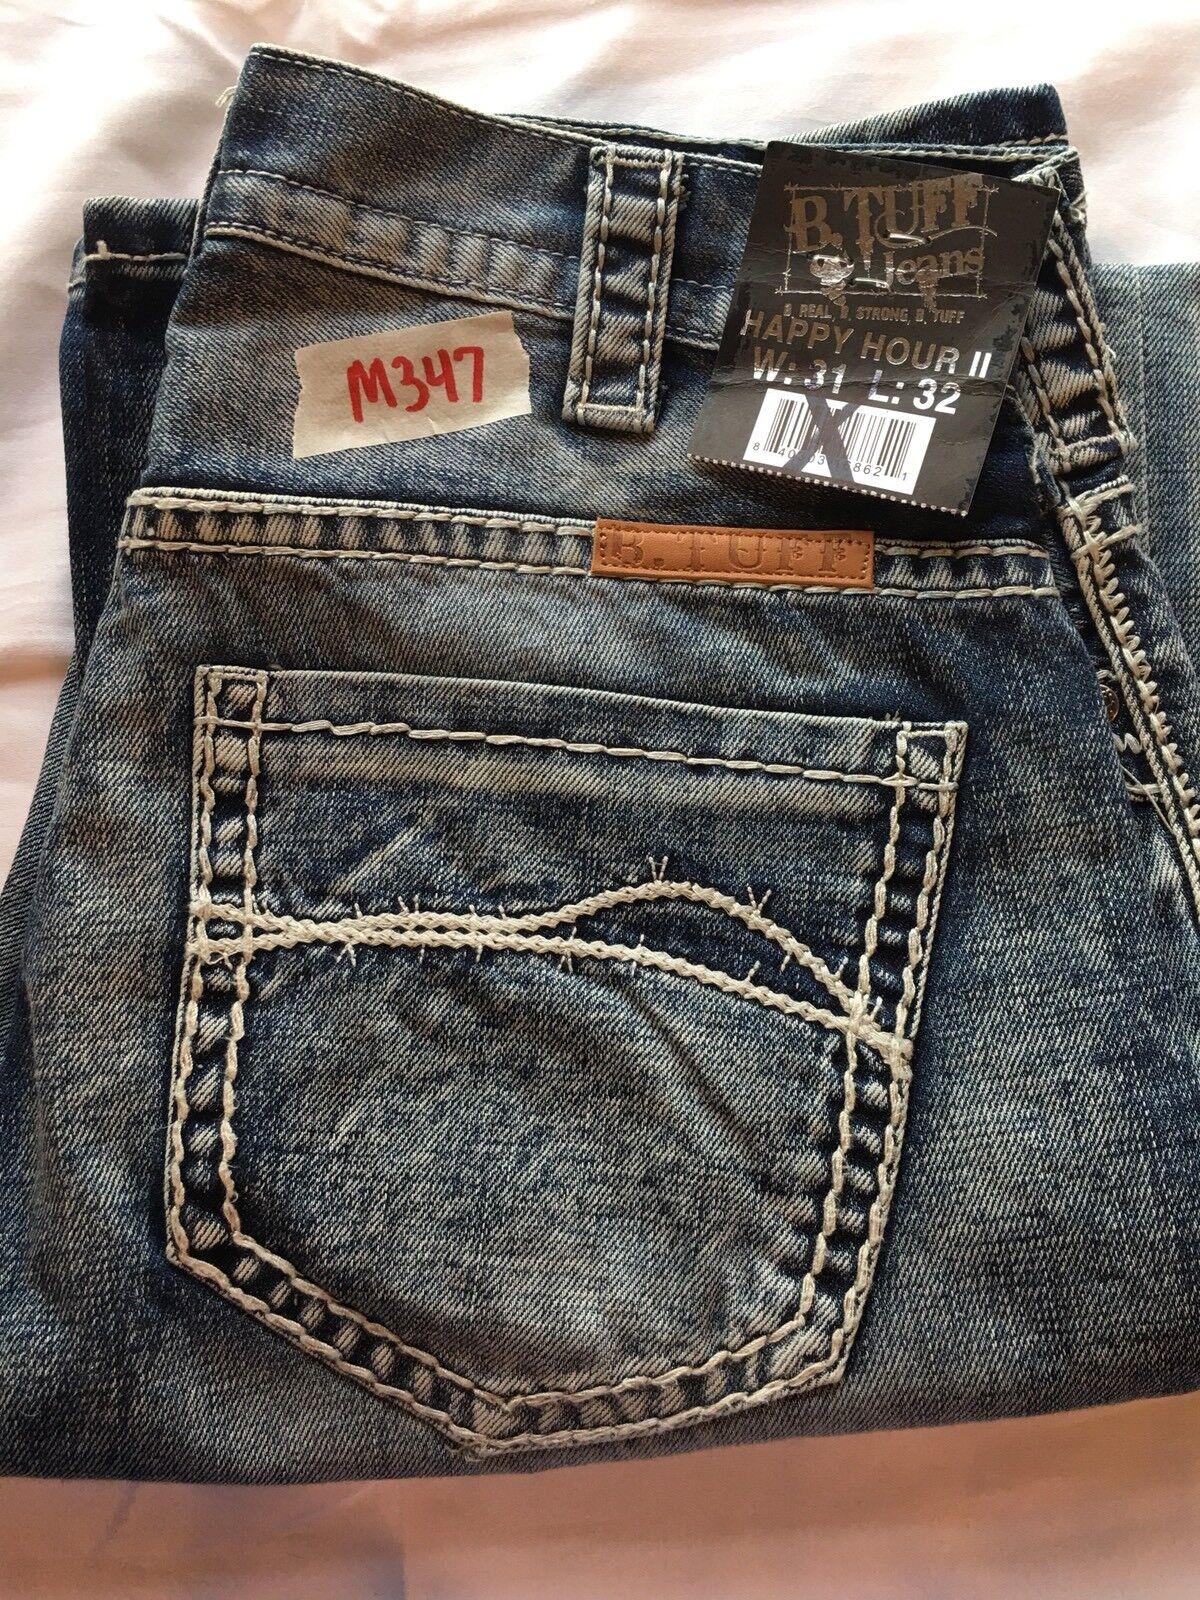 Mens New B Tuff 31X32 Happy Hour II Mid Rise Boot Cut Distressed Jeans